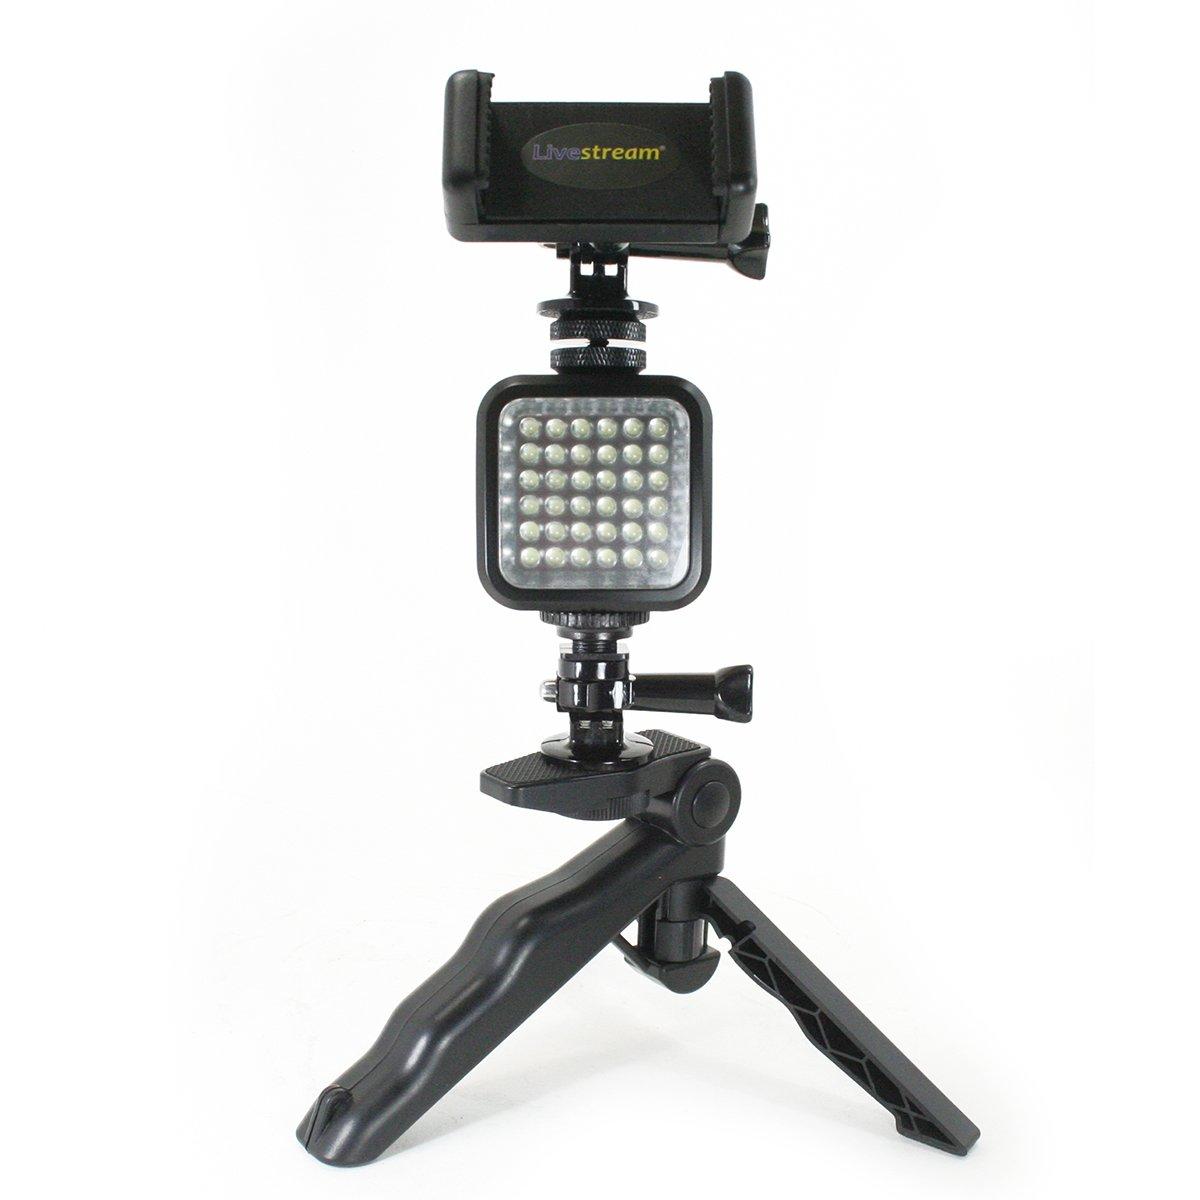 Livestream Gear LS-LED Tripod LED Video Light with tripod